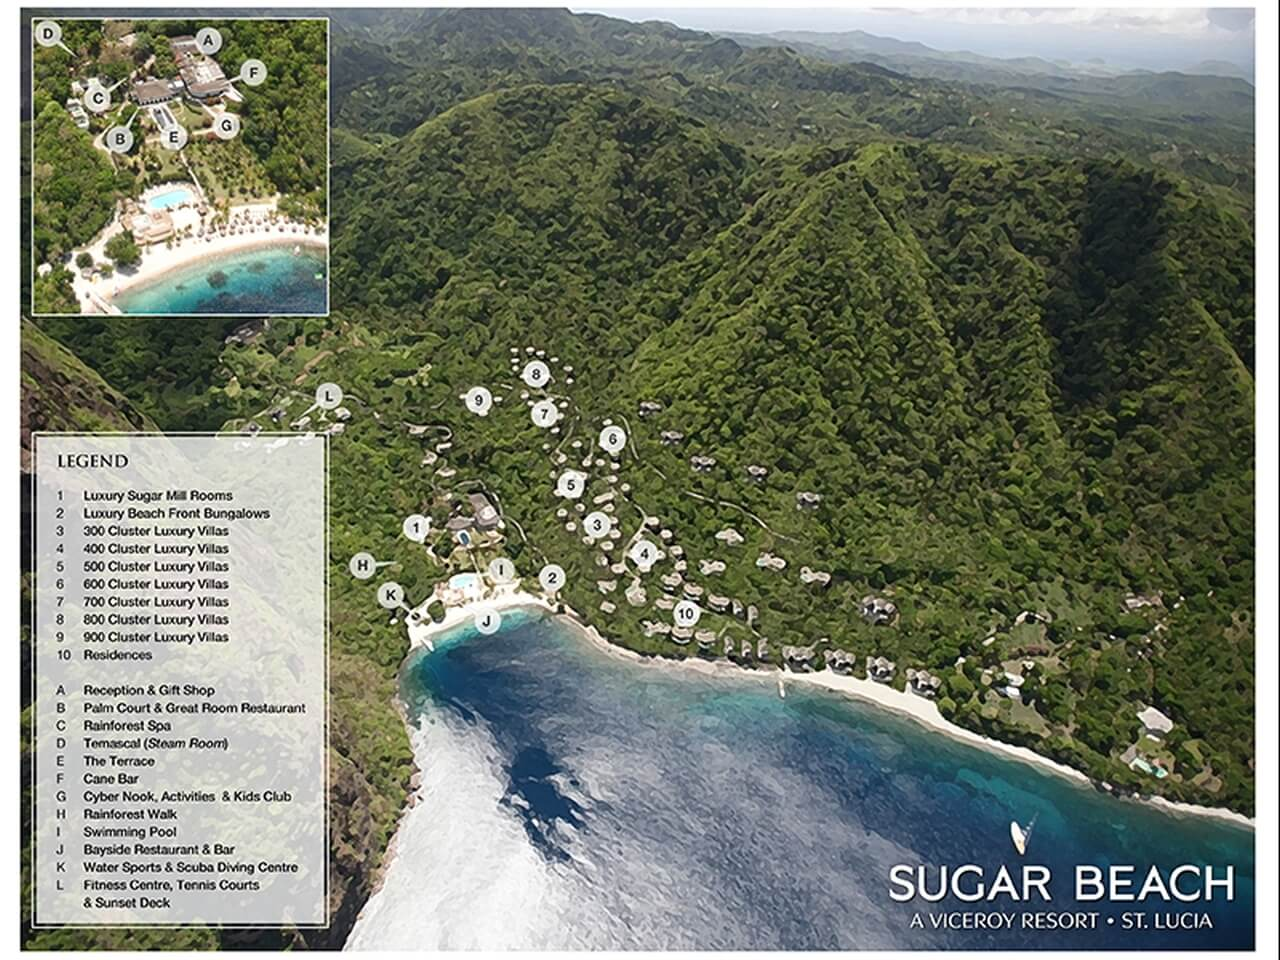 sugar beach a viceroy resort st lucia jetzt bei landmark buchen. Black Bedroom Furniture Sets. Home Design Ideas